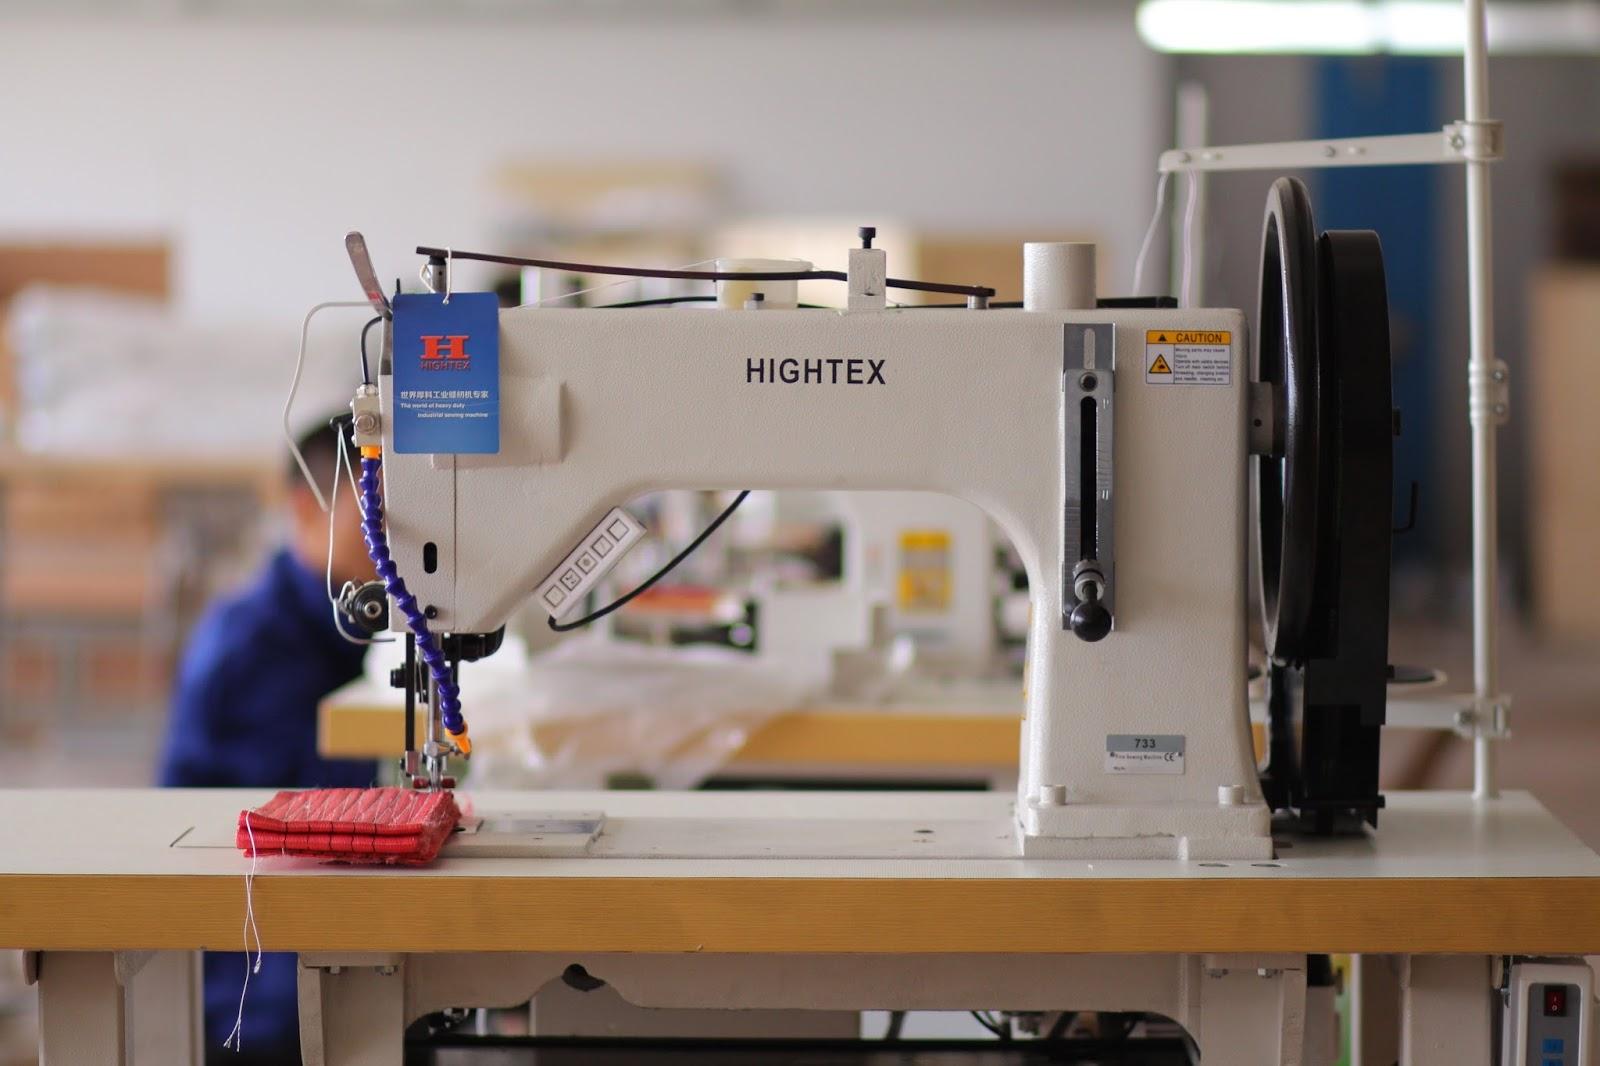 hightex sewing machine